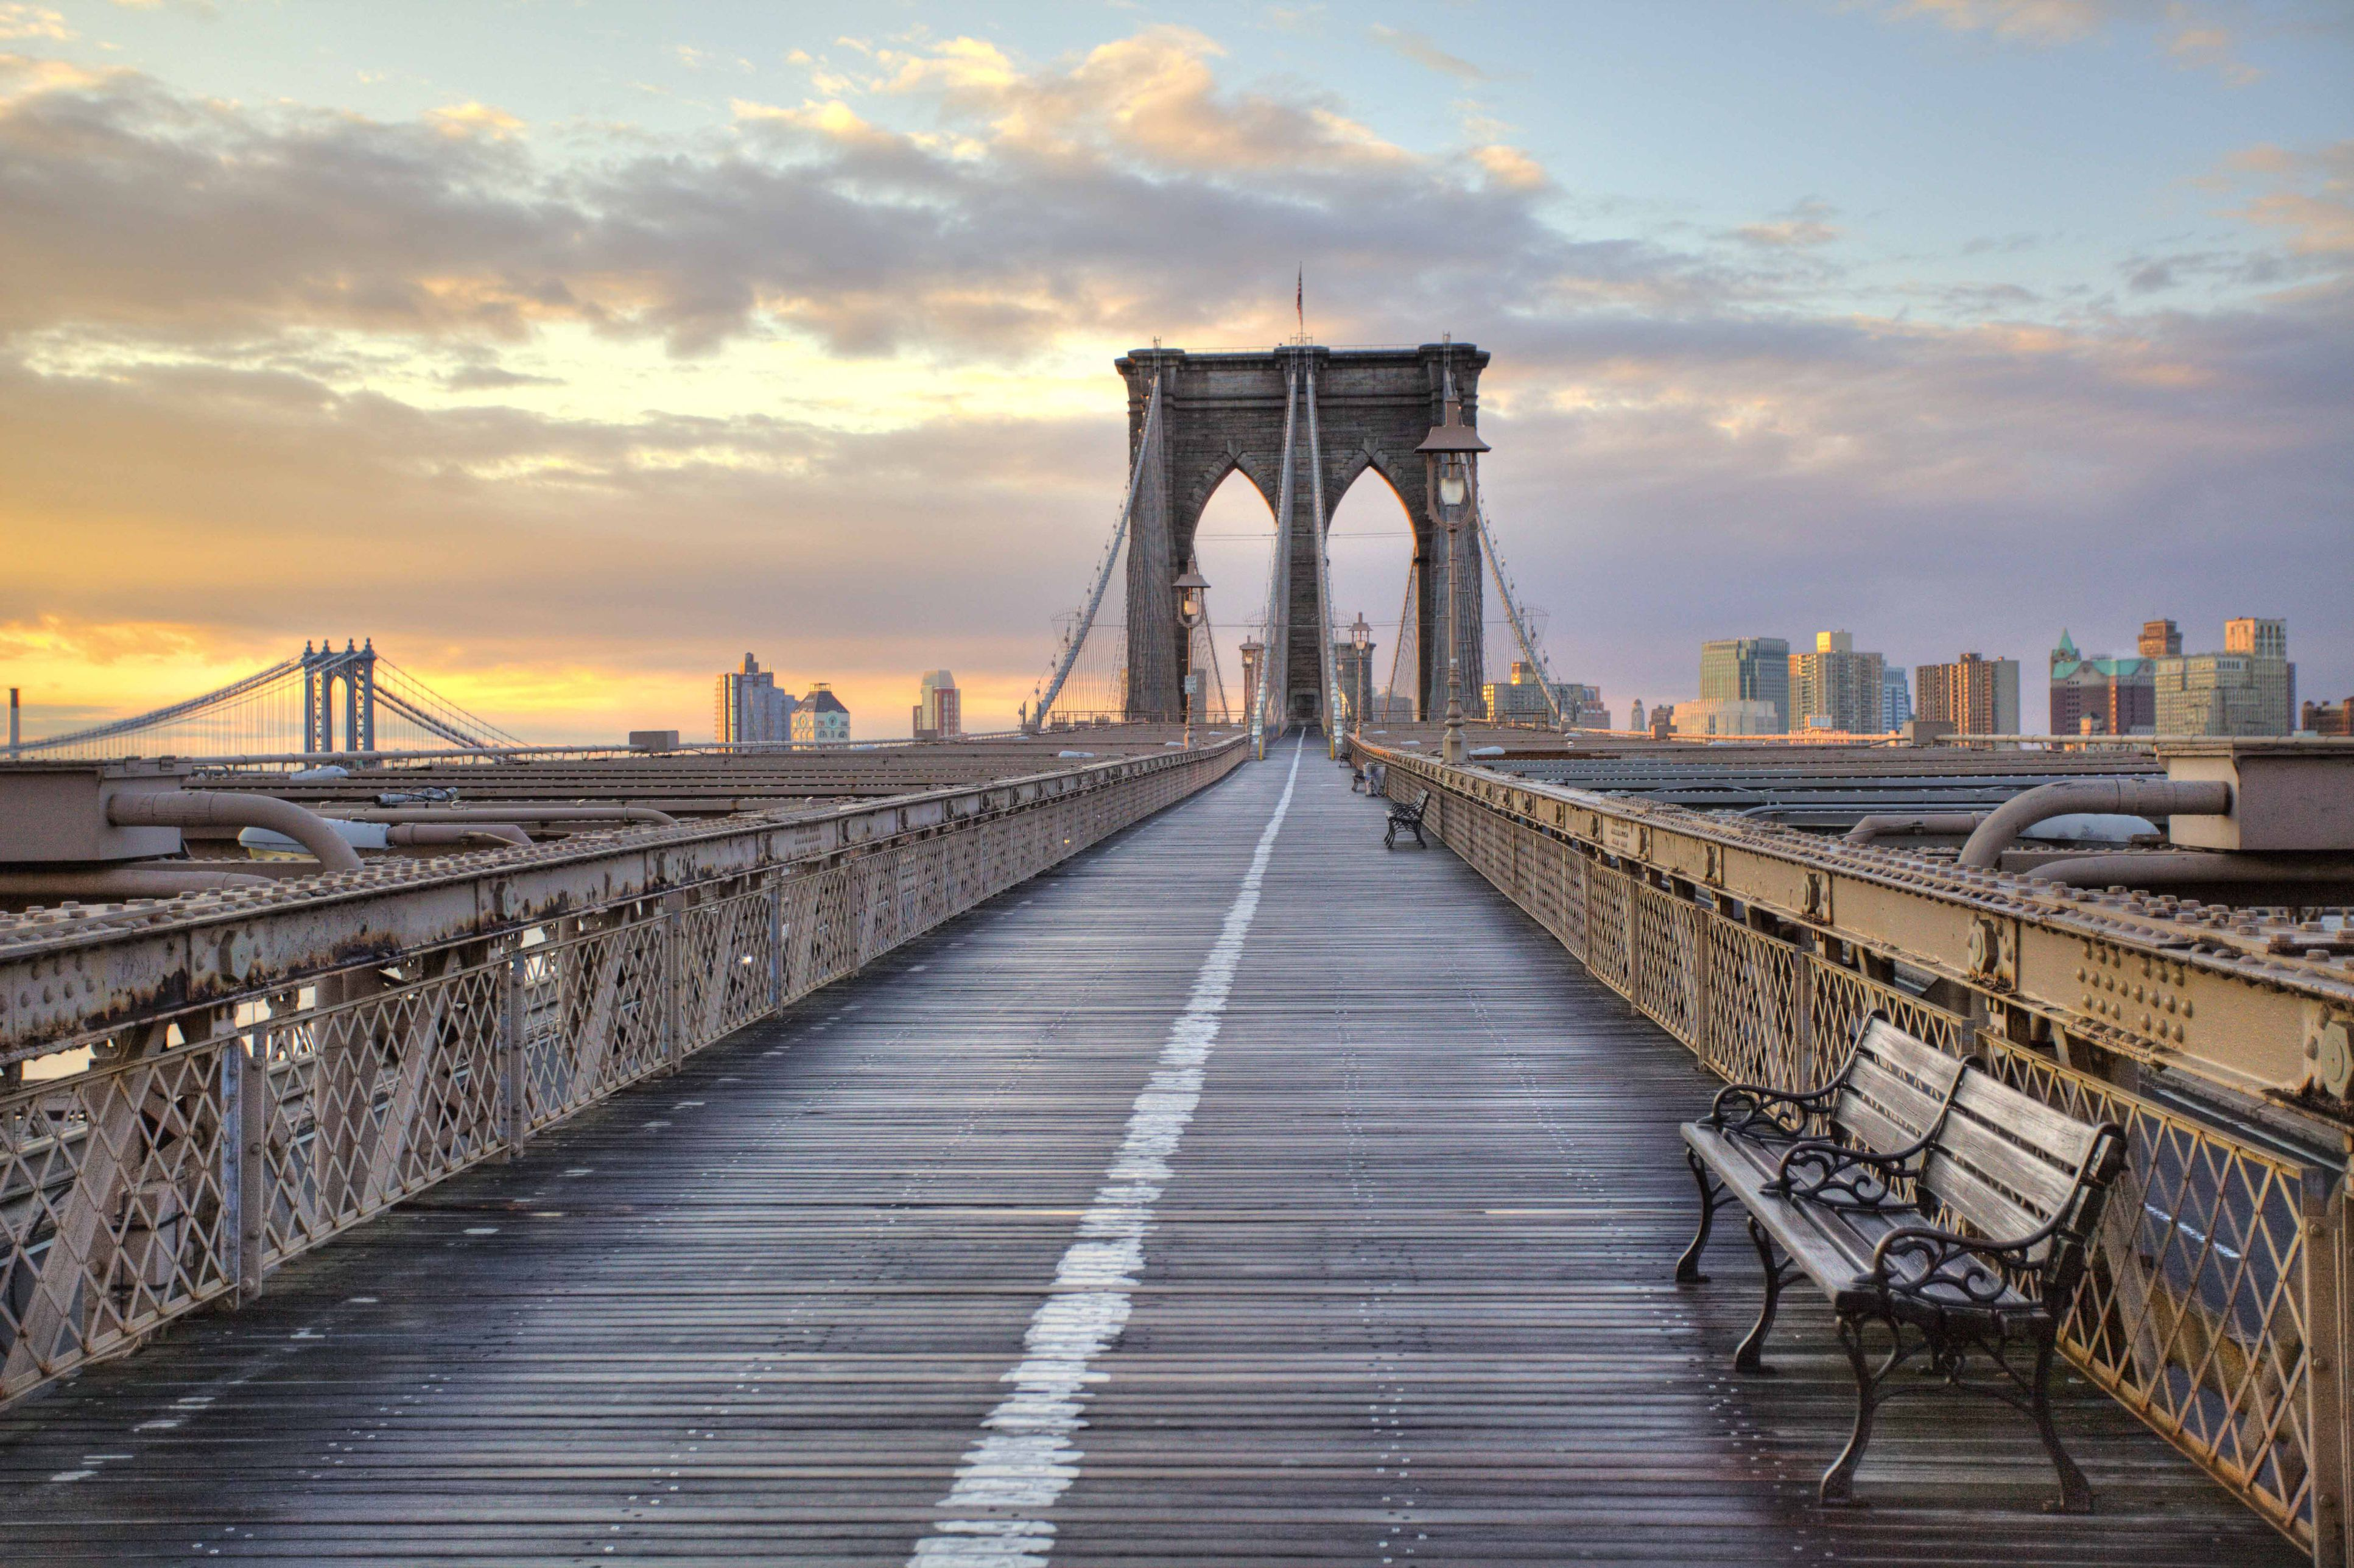 Top 10 Tips for Walking Across the Brooklyn Bridge